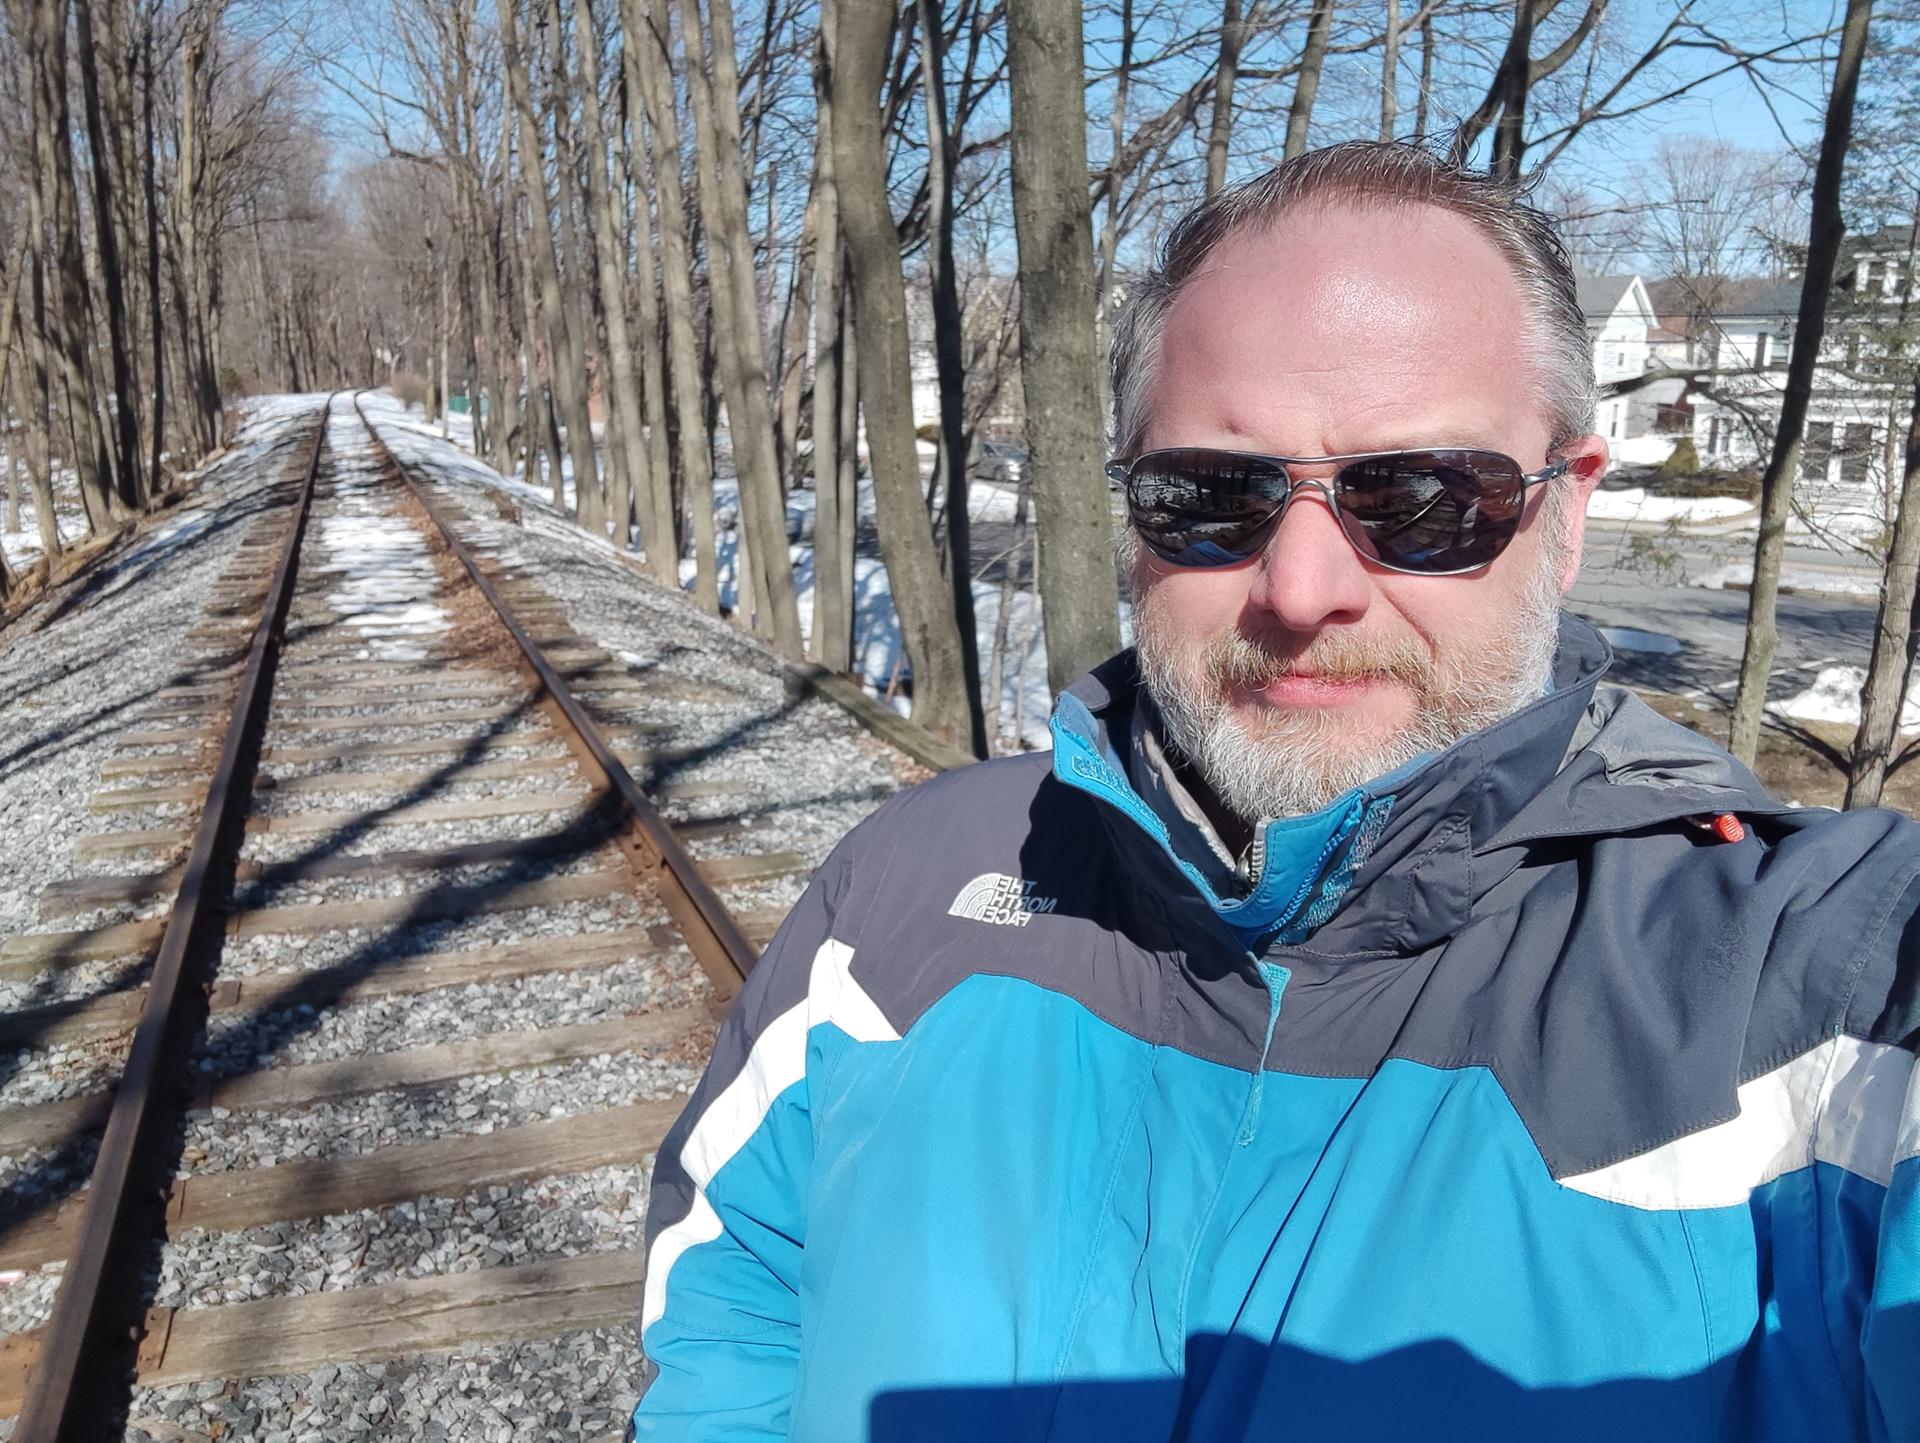 Redmi Note 10 Pro photo sample selfie